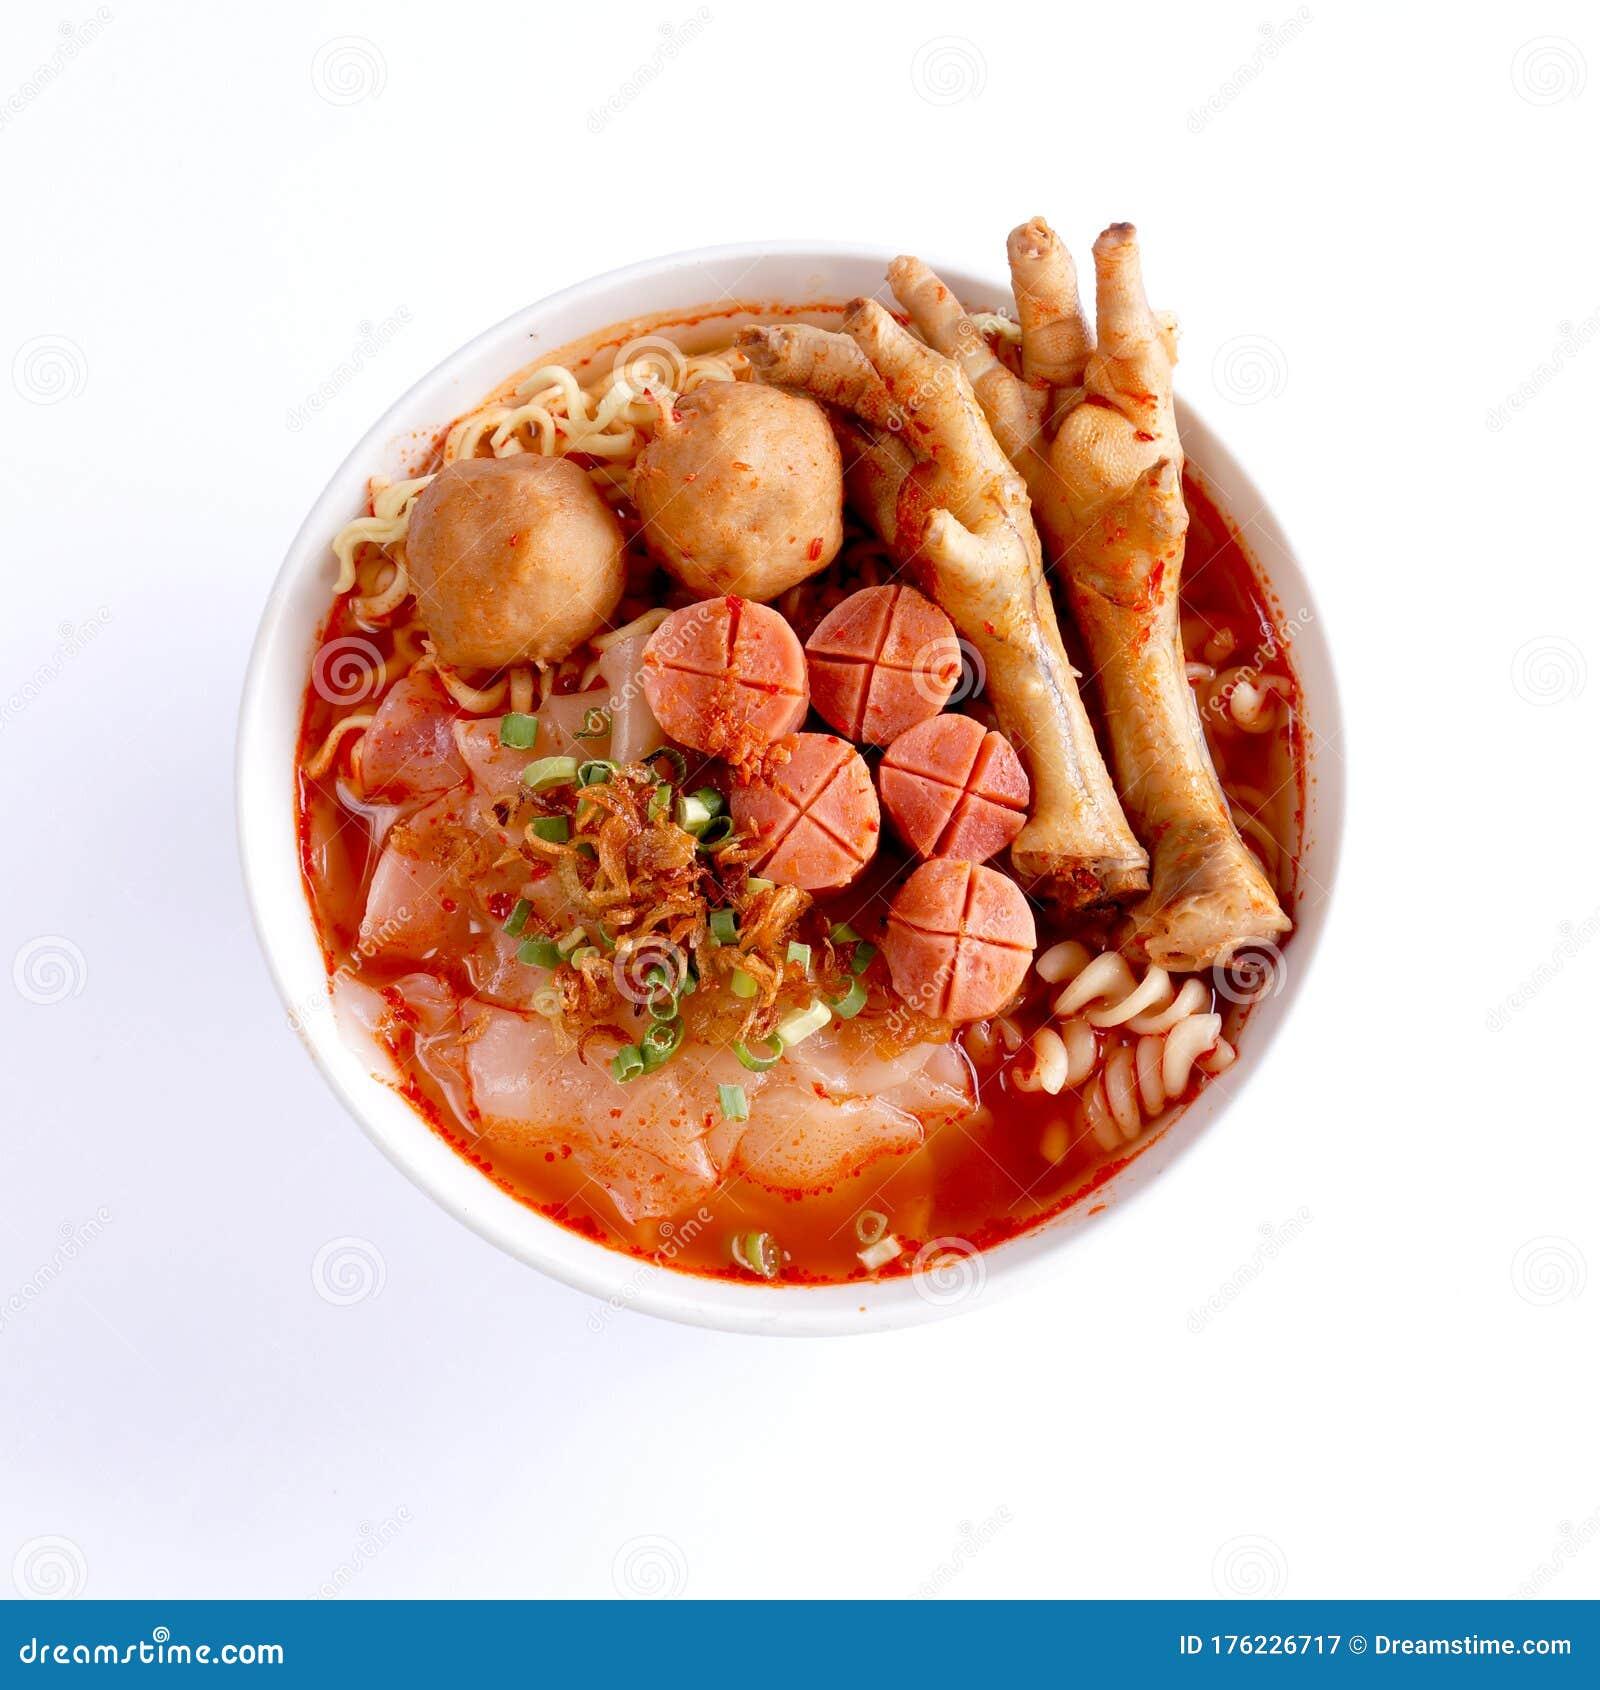 Seblak Jeletot Indonesia Traditional Food Stock Image Image Of Background Meal 176226717